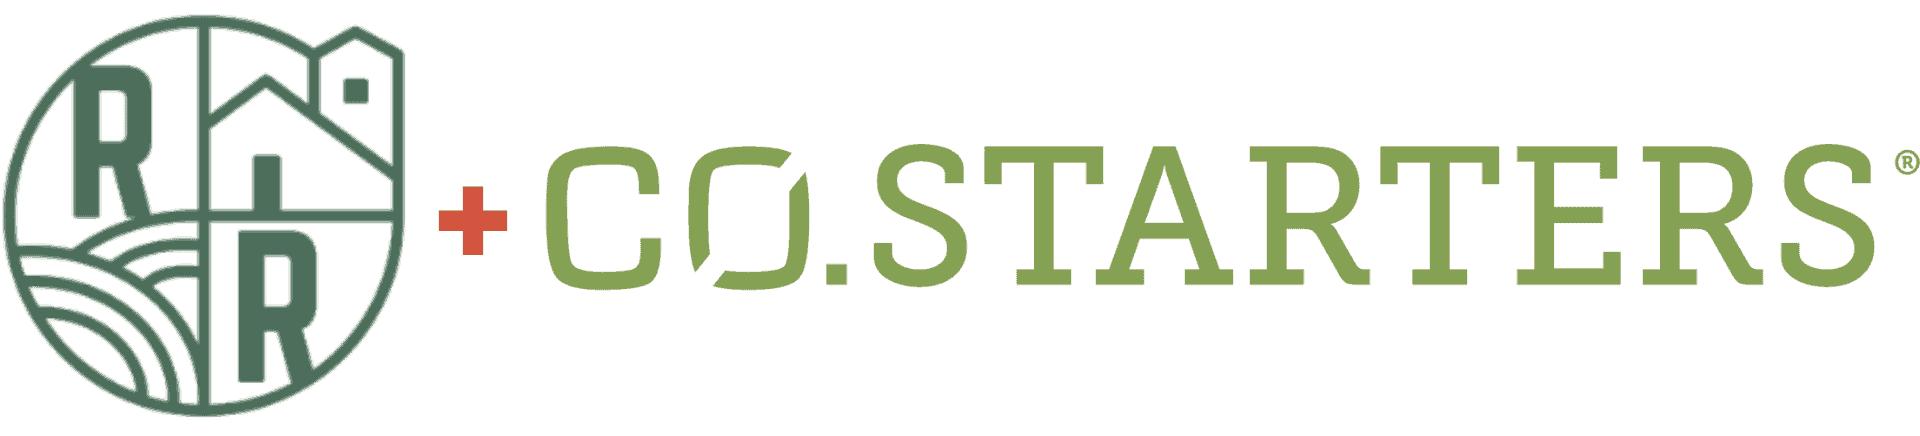 Reinventing Rural & CoStarters Logo